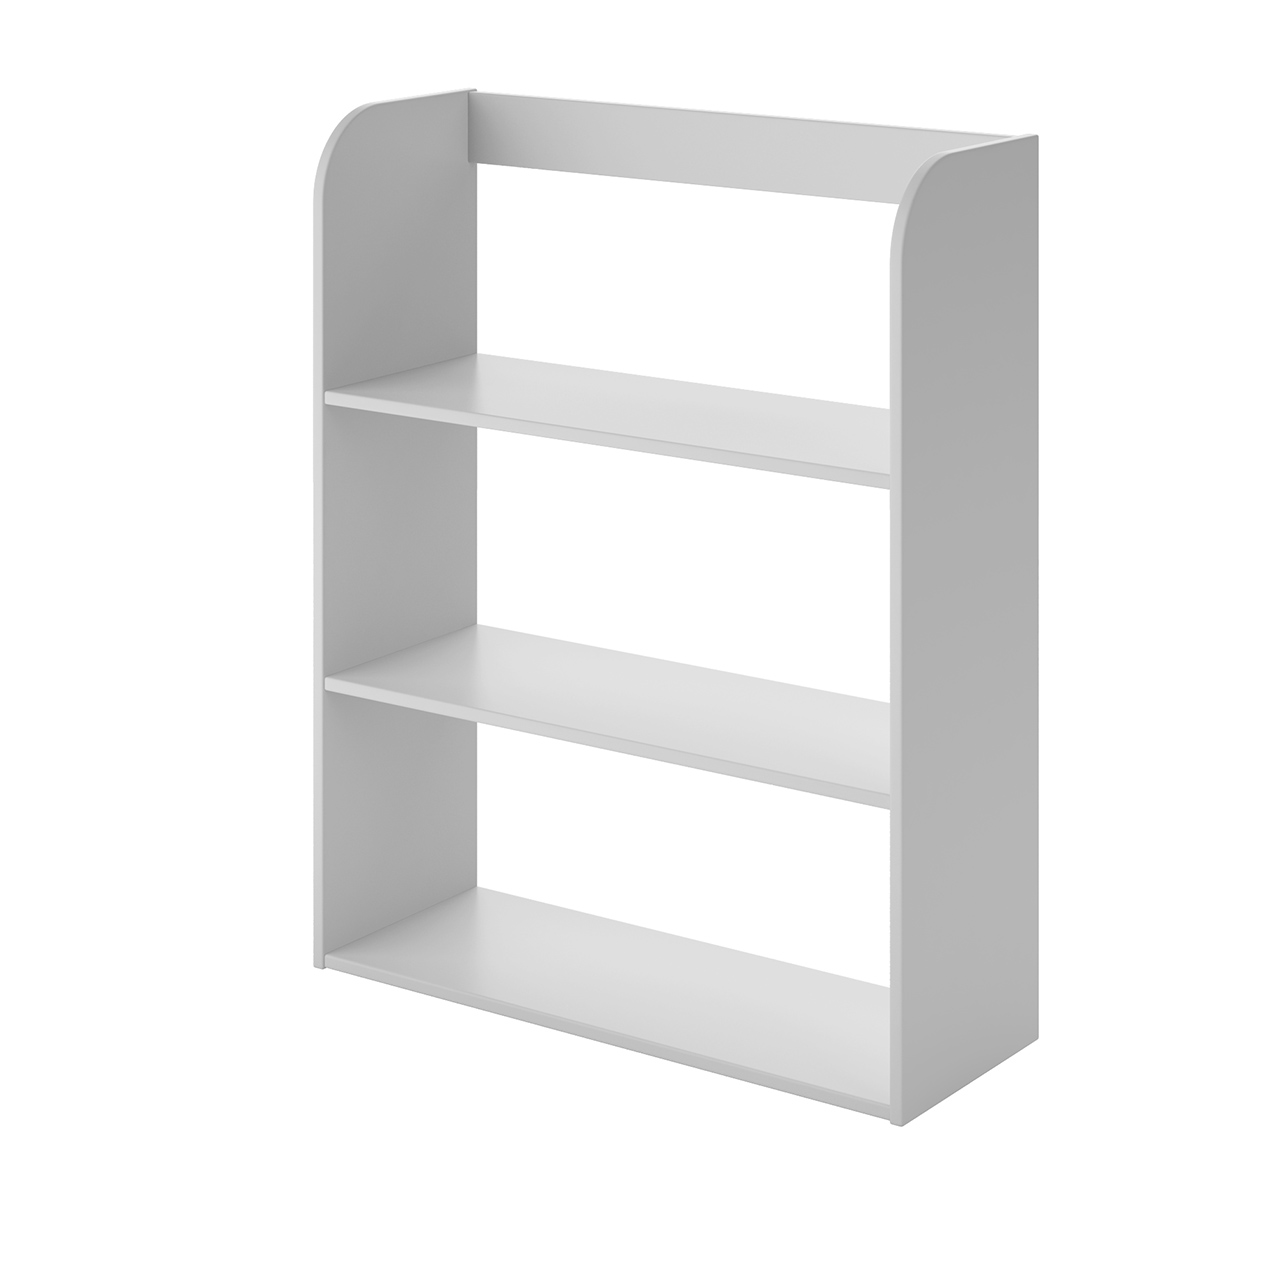 Play Shelf by Flexa